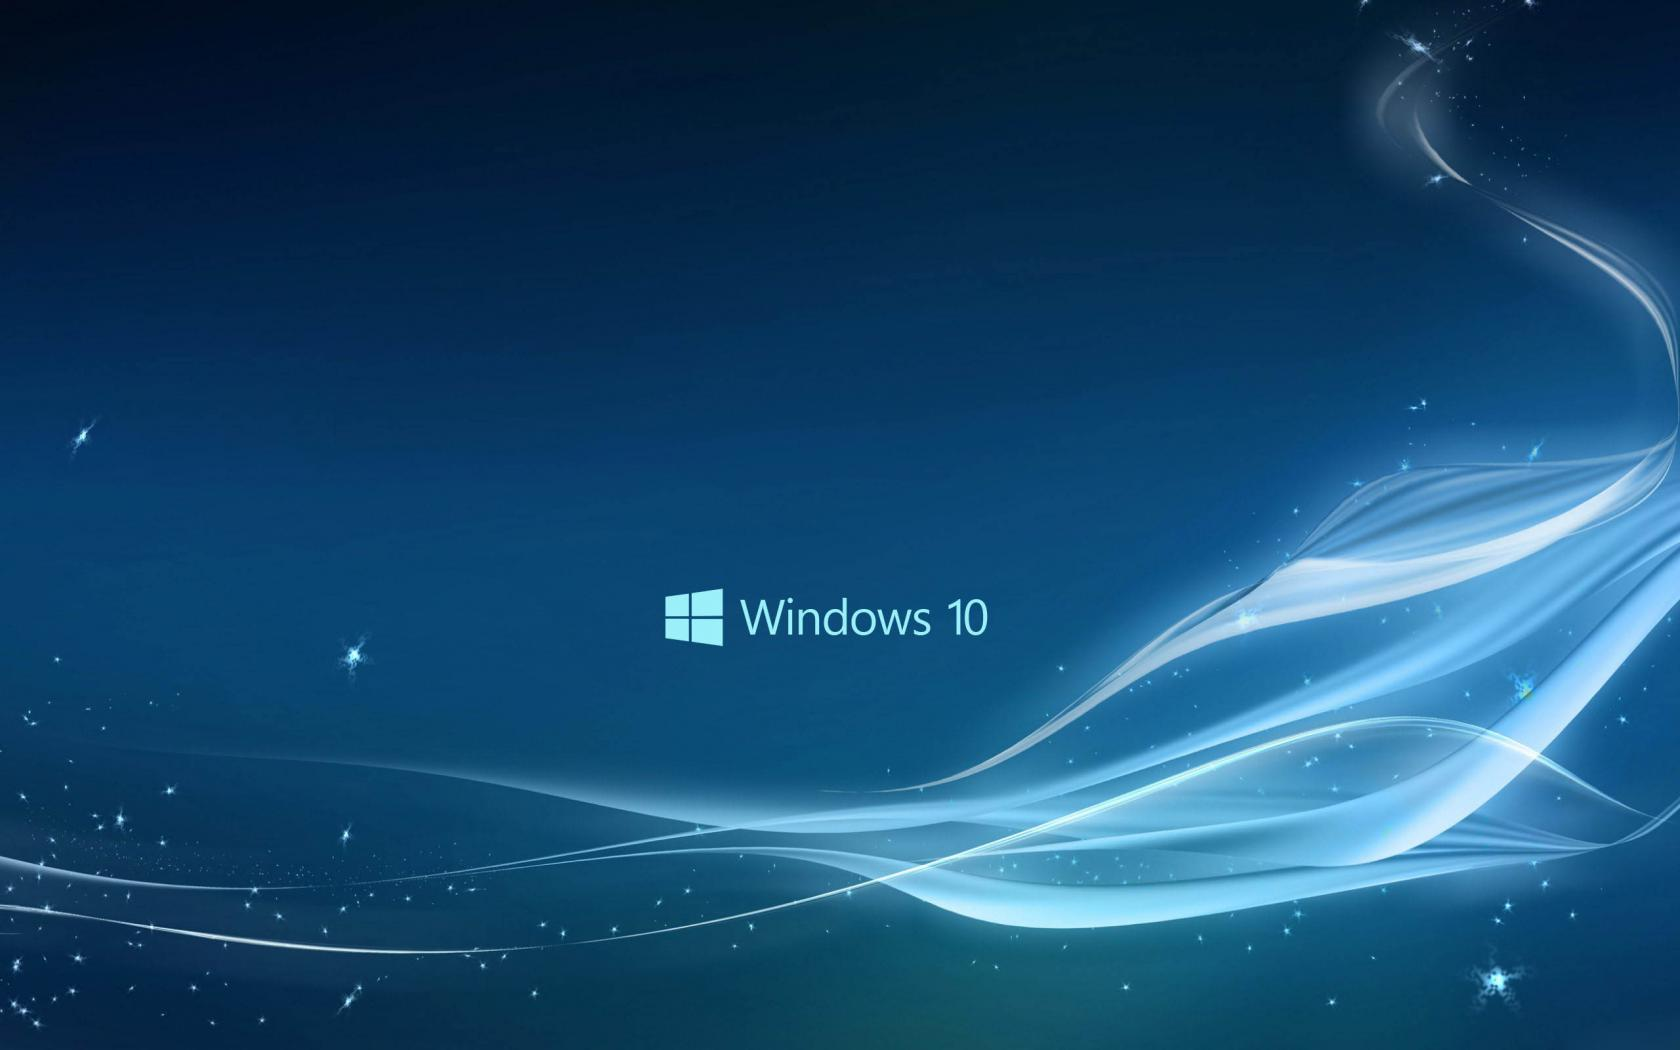 50 Wallpaper For Windows 10 1680x1050 On Wallpapersafari